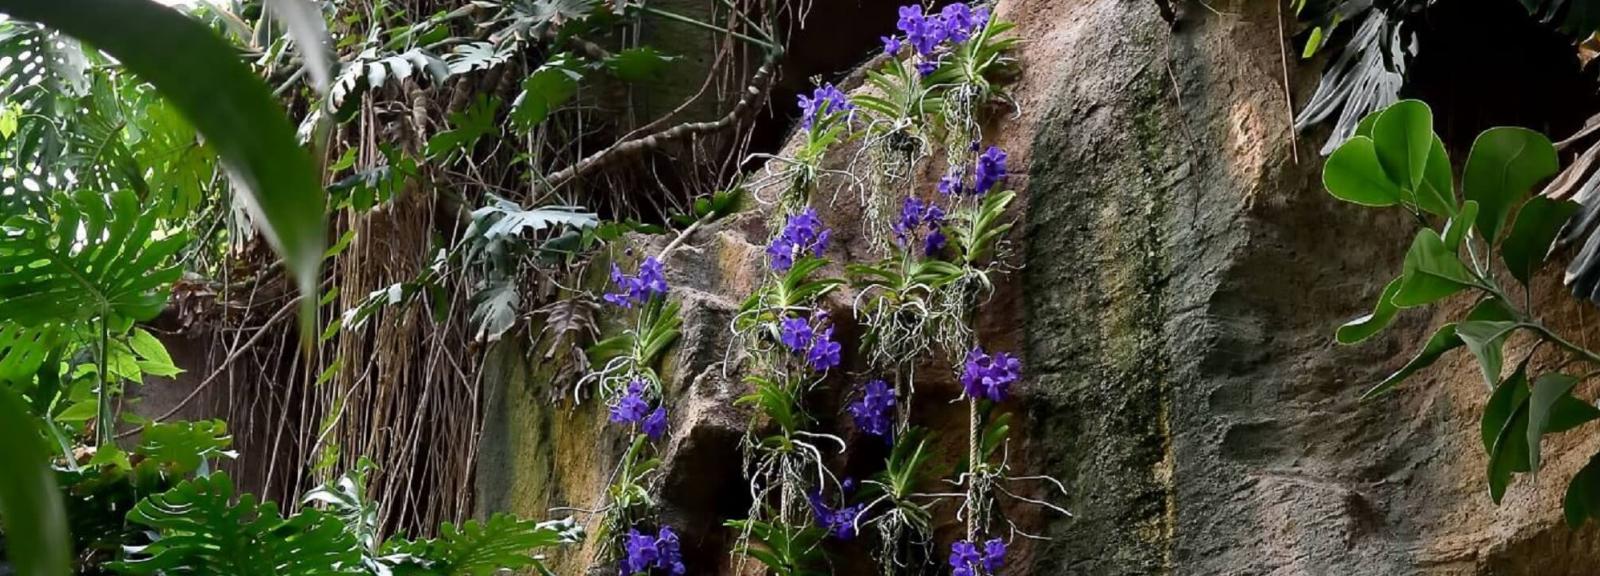 Épiphytes © MNHN - F.-G. Grandin